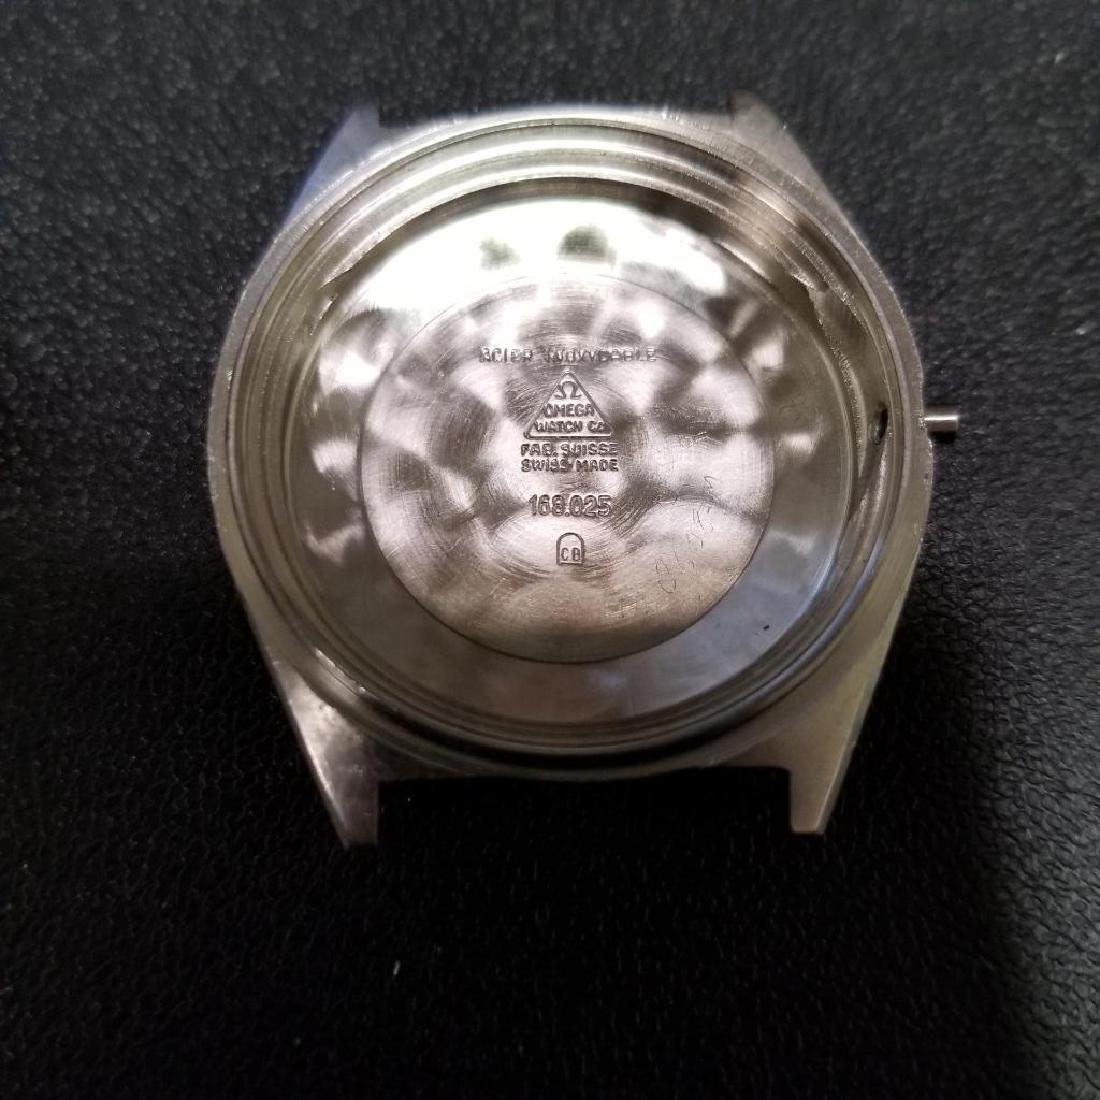 Omega Vintage 1968 Constellation Piepan Rare Automatic - 9